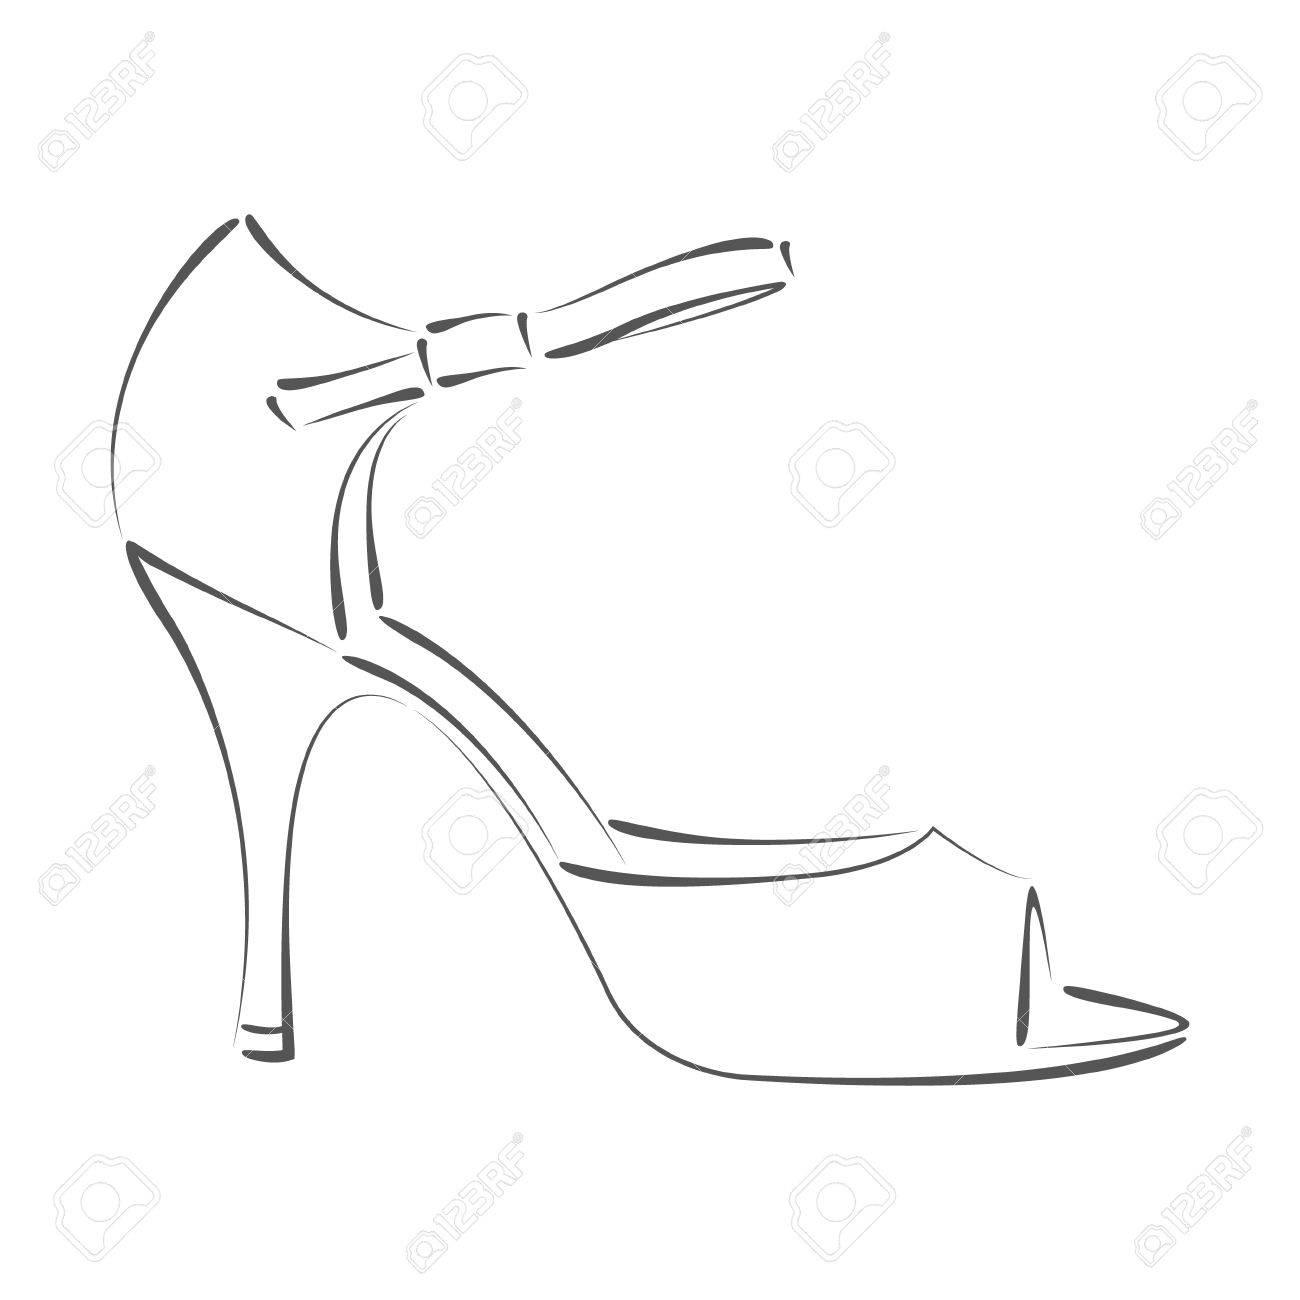 Elegant Sketched Woman S Shoe. Argentine Tango Dance Shoes. Design ...